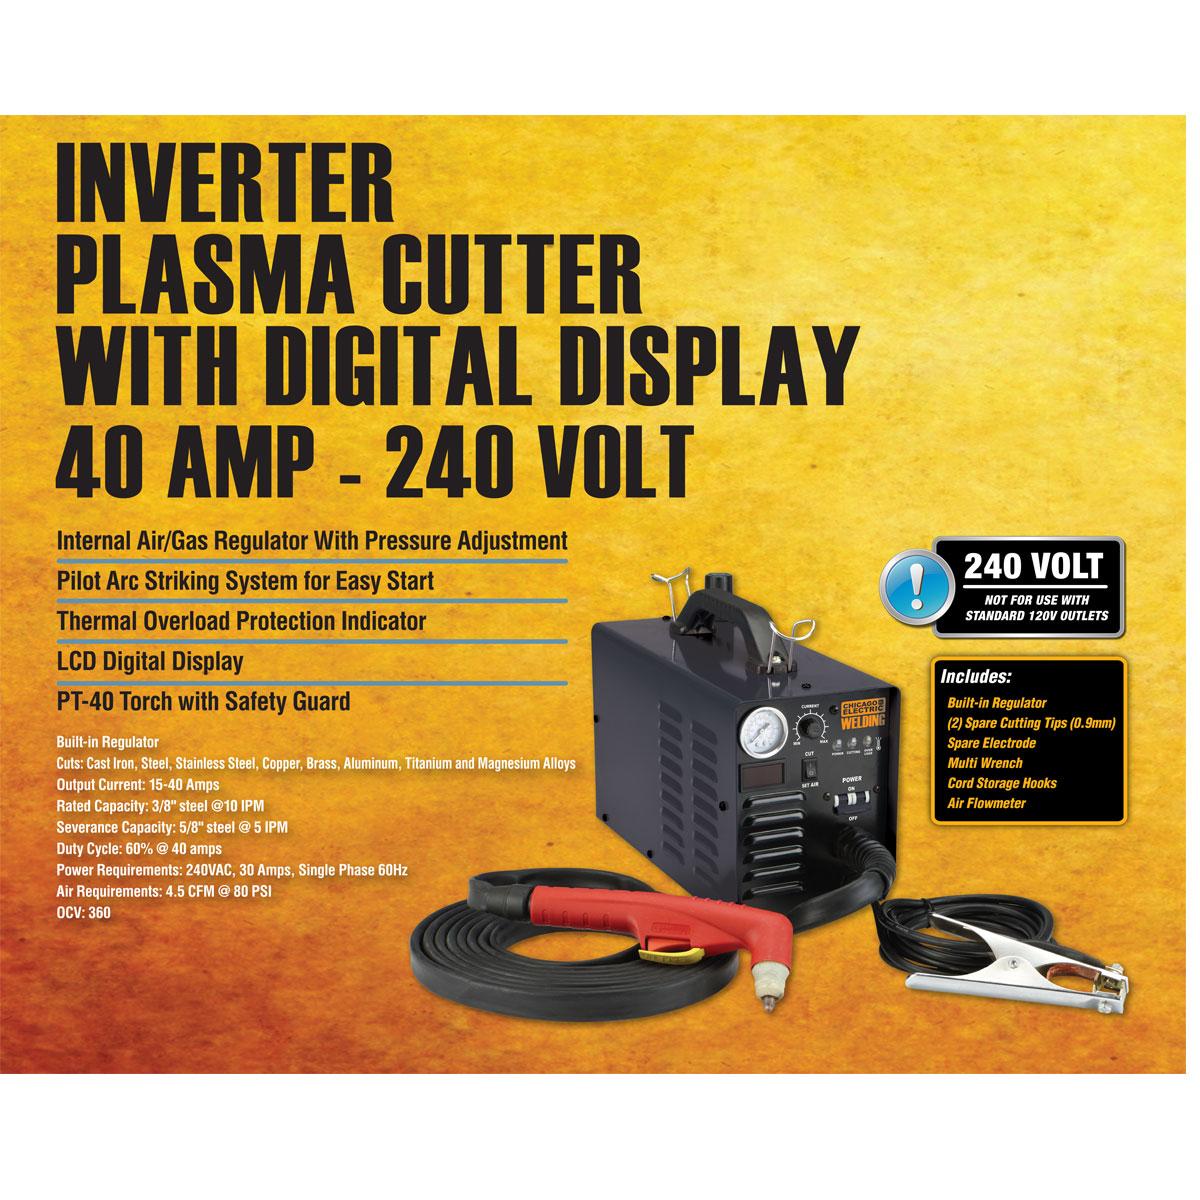 Plasma cutter harbor freight